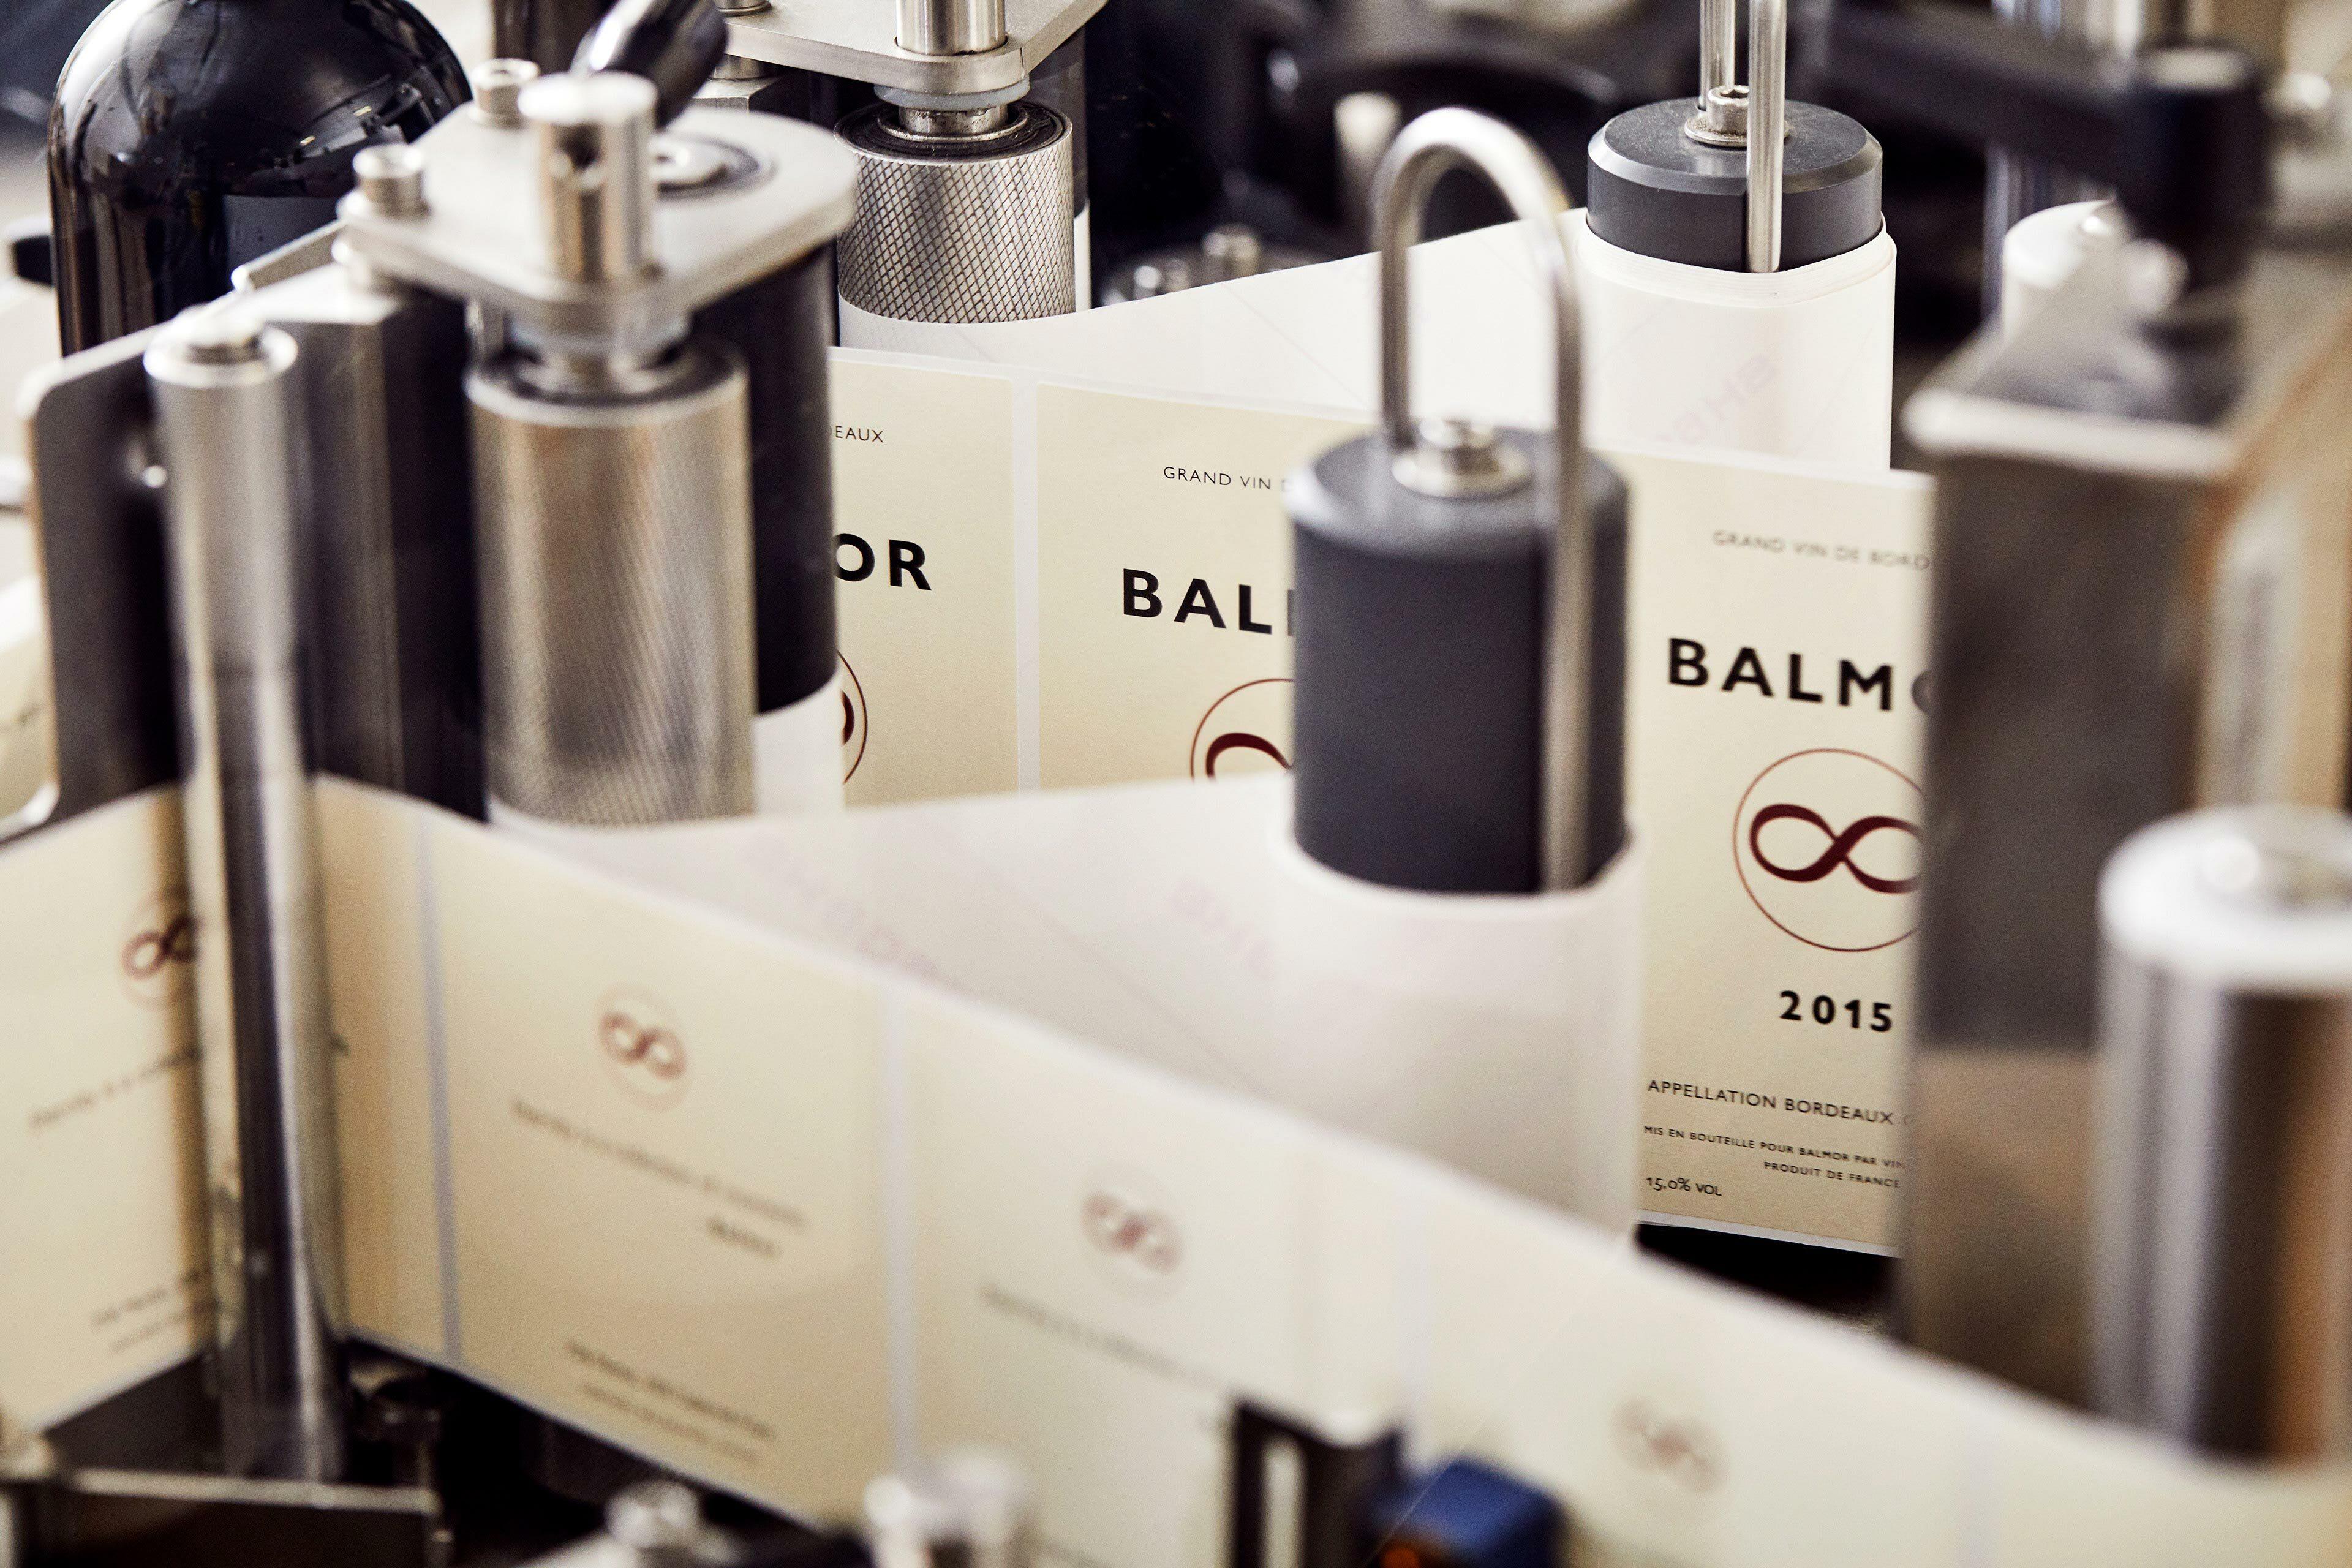 Richard Moran Viniv Wine Bordeaux Lifestyle 028